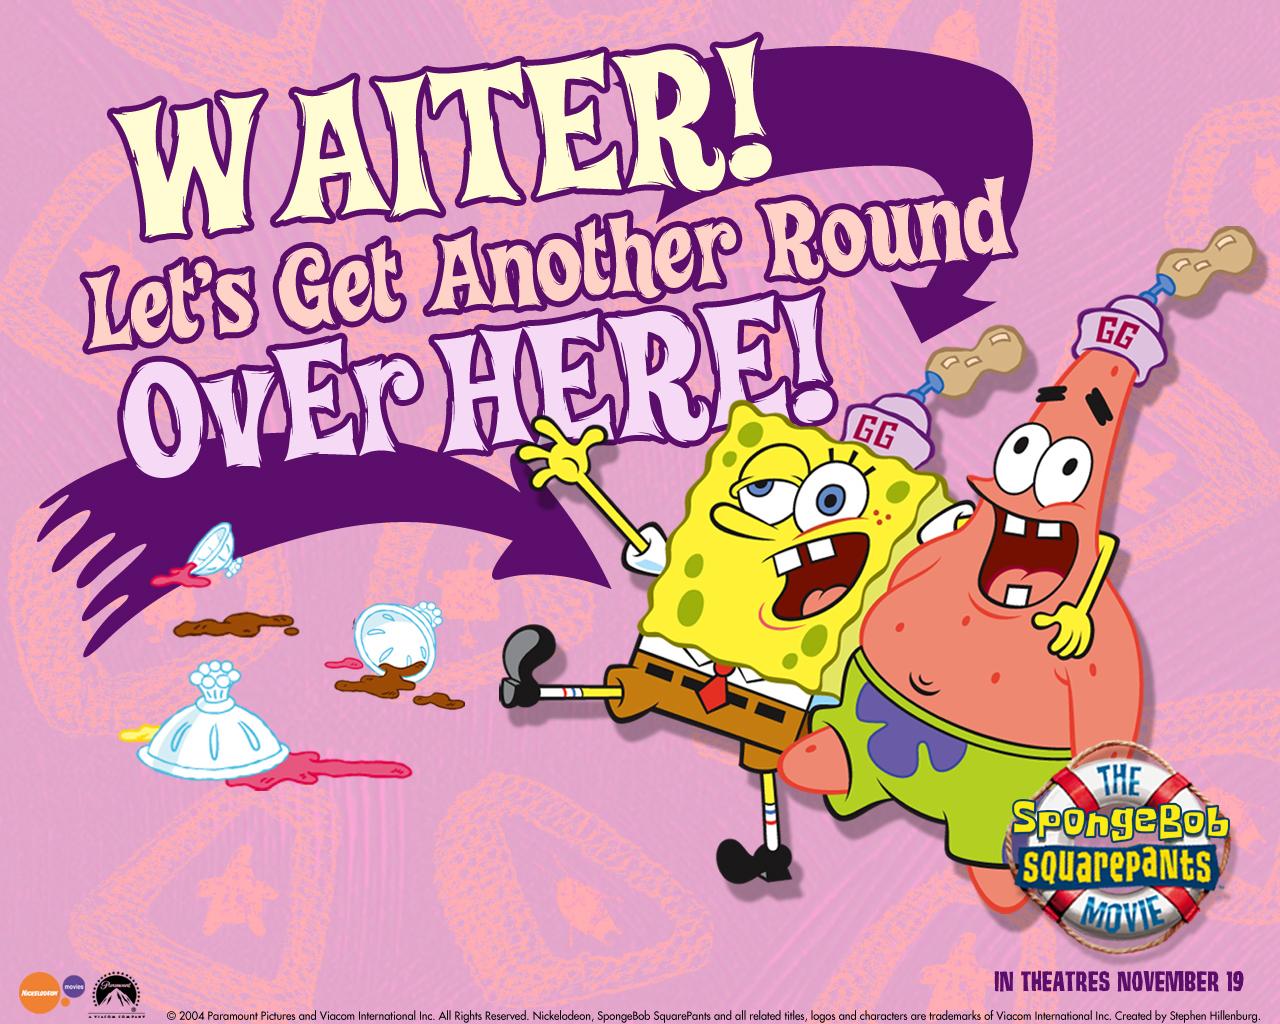 the spongebob squarepants